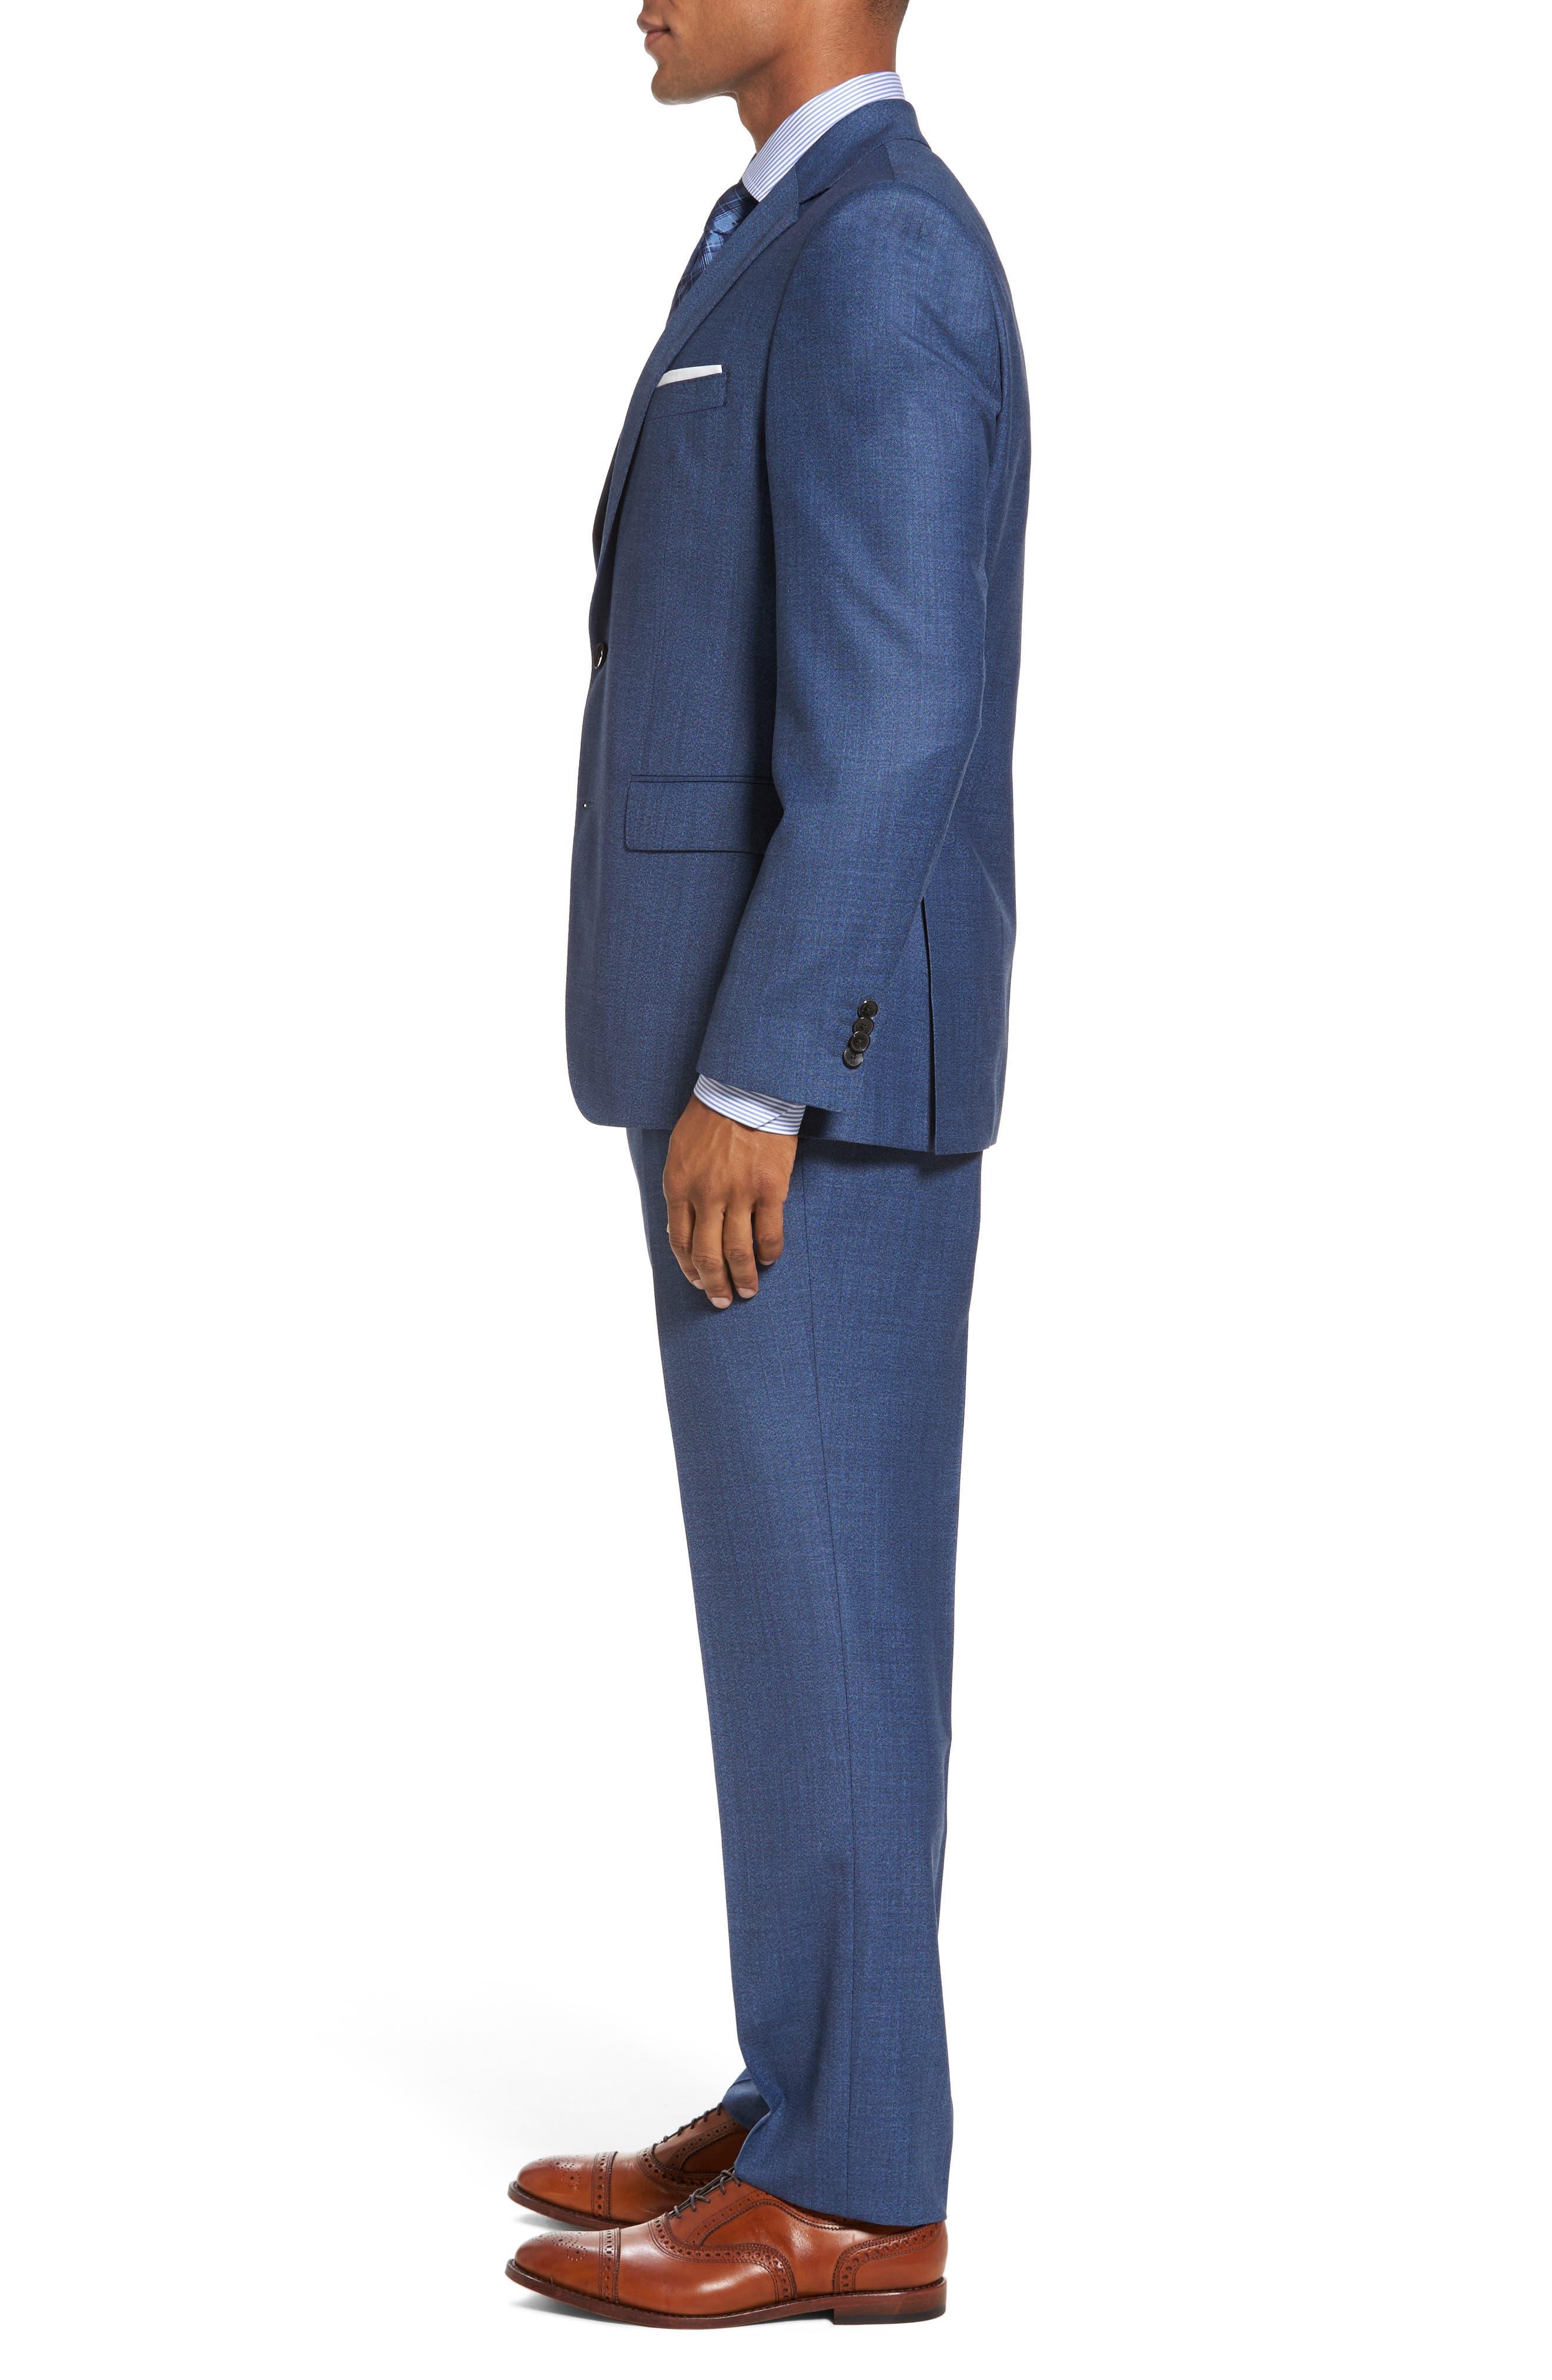 Johnstons/Lenon Classic Fit Solid Wool Suit,                             Alternate thumbnail 3, color,                             Medium Blue